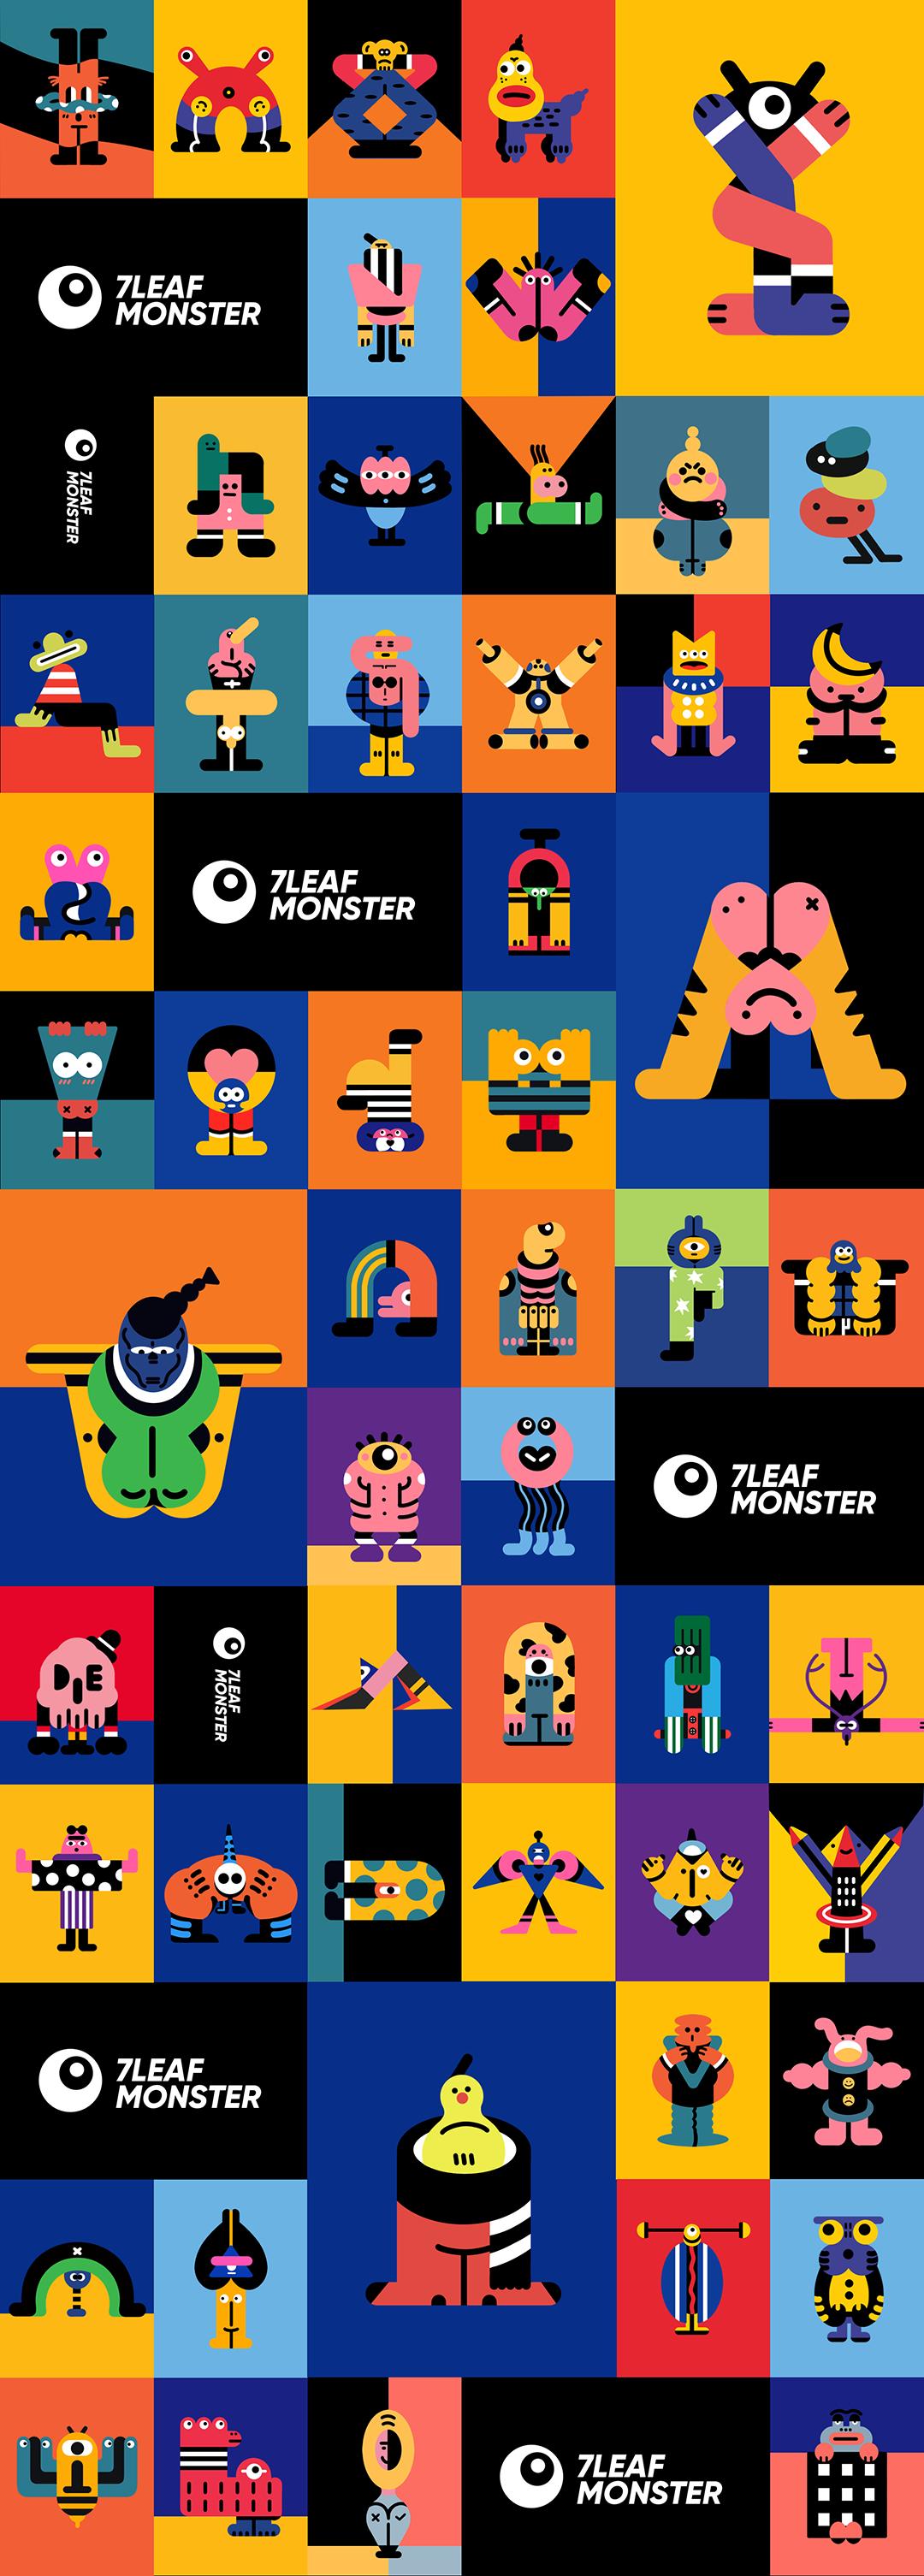 GirlsclubAsia-Illustrator-7Leaf Han-7LEAF MONSTER 3